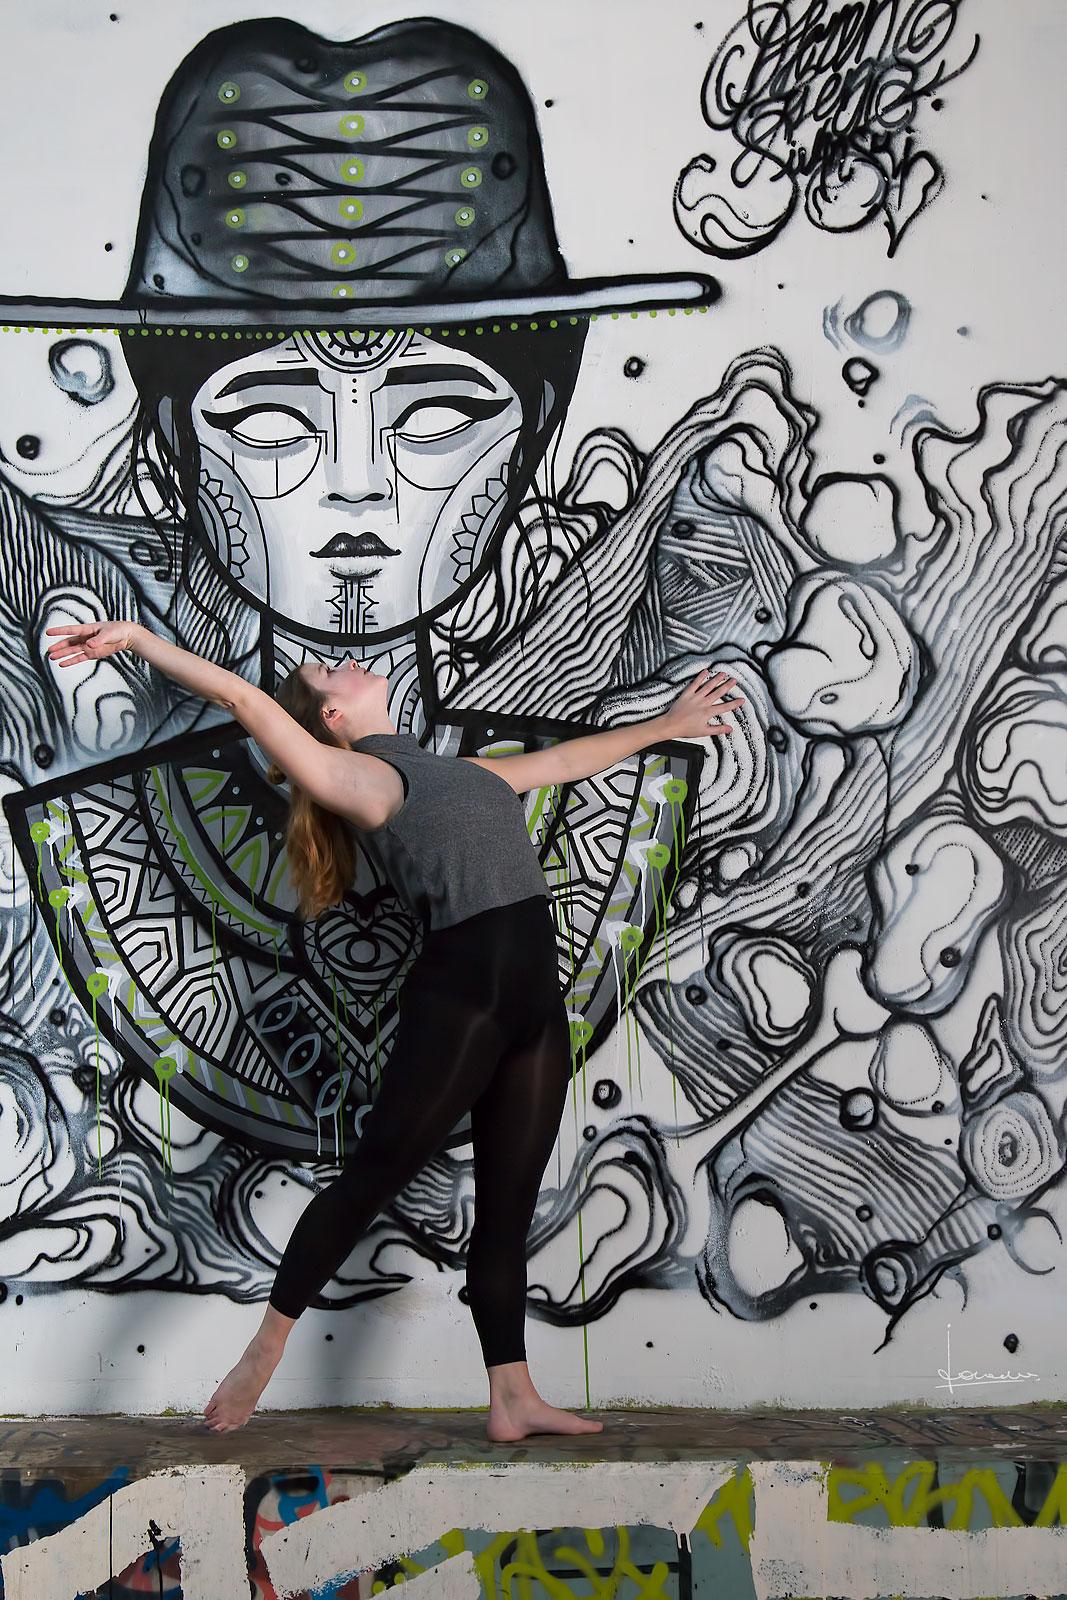 Graffity onder een rustig spoorviaduct. Moderne dans en inlevingsvermogen.